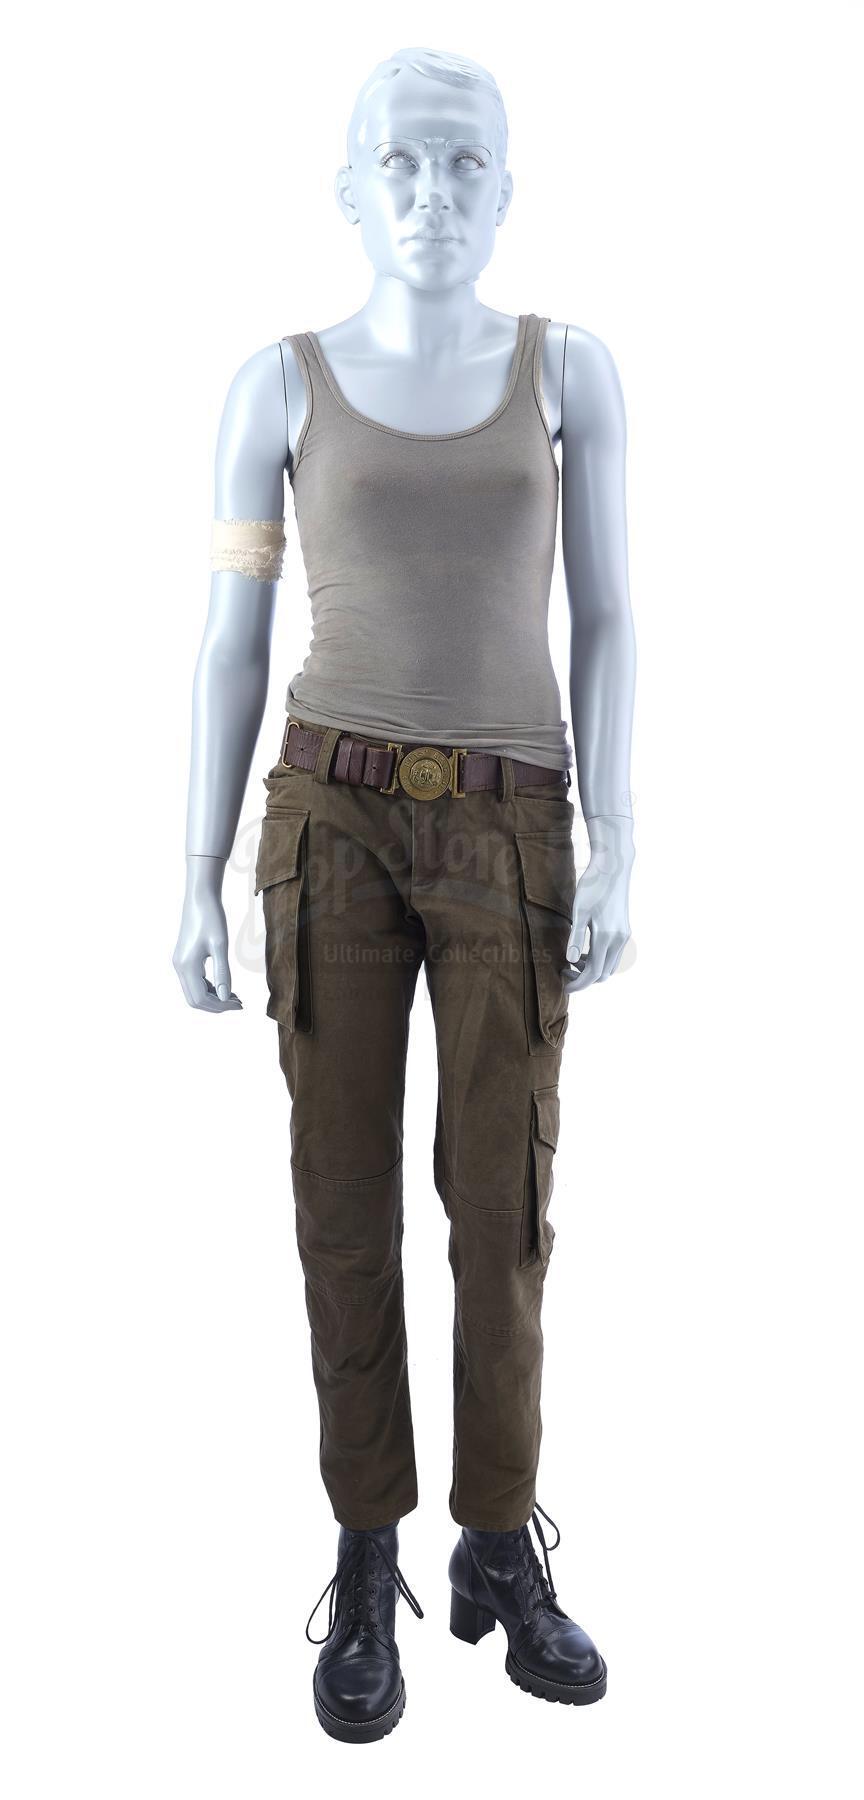 Lot # 384: TOMB RAIDER - Lara Croft's (Alicia Vikander) Costume